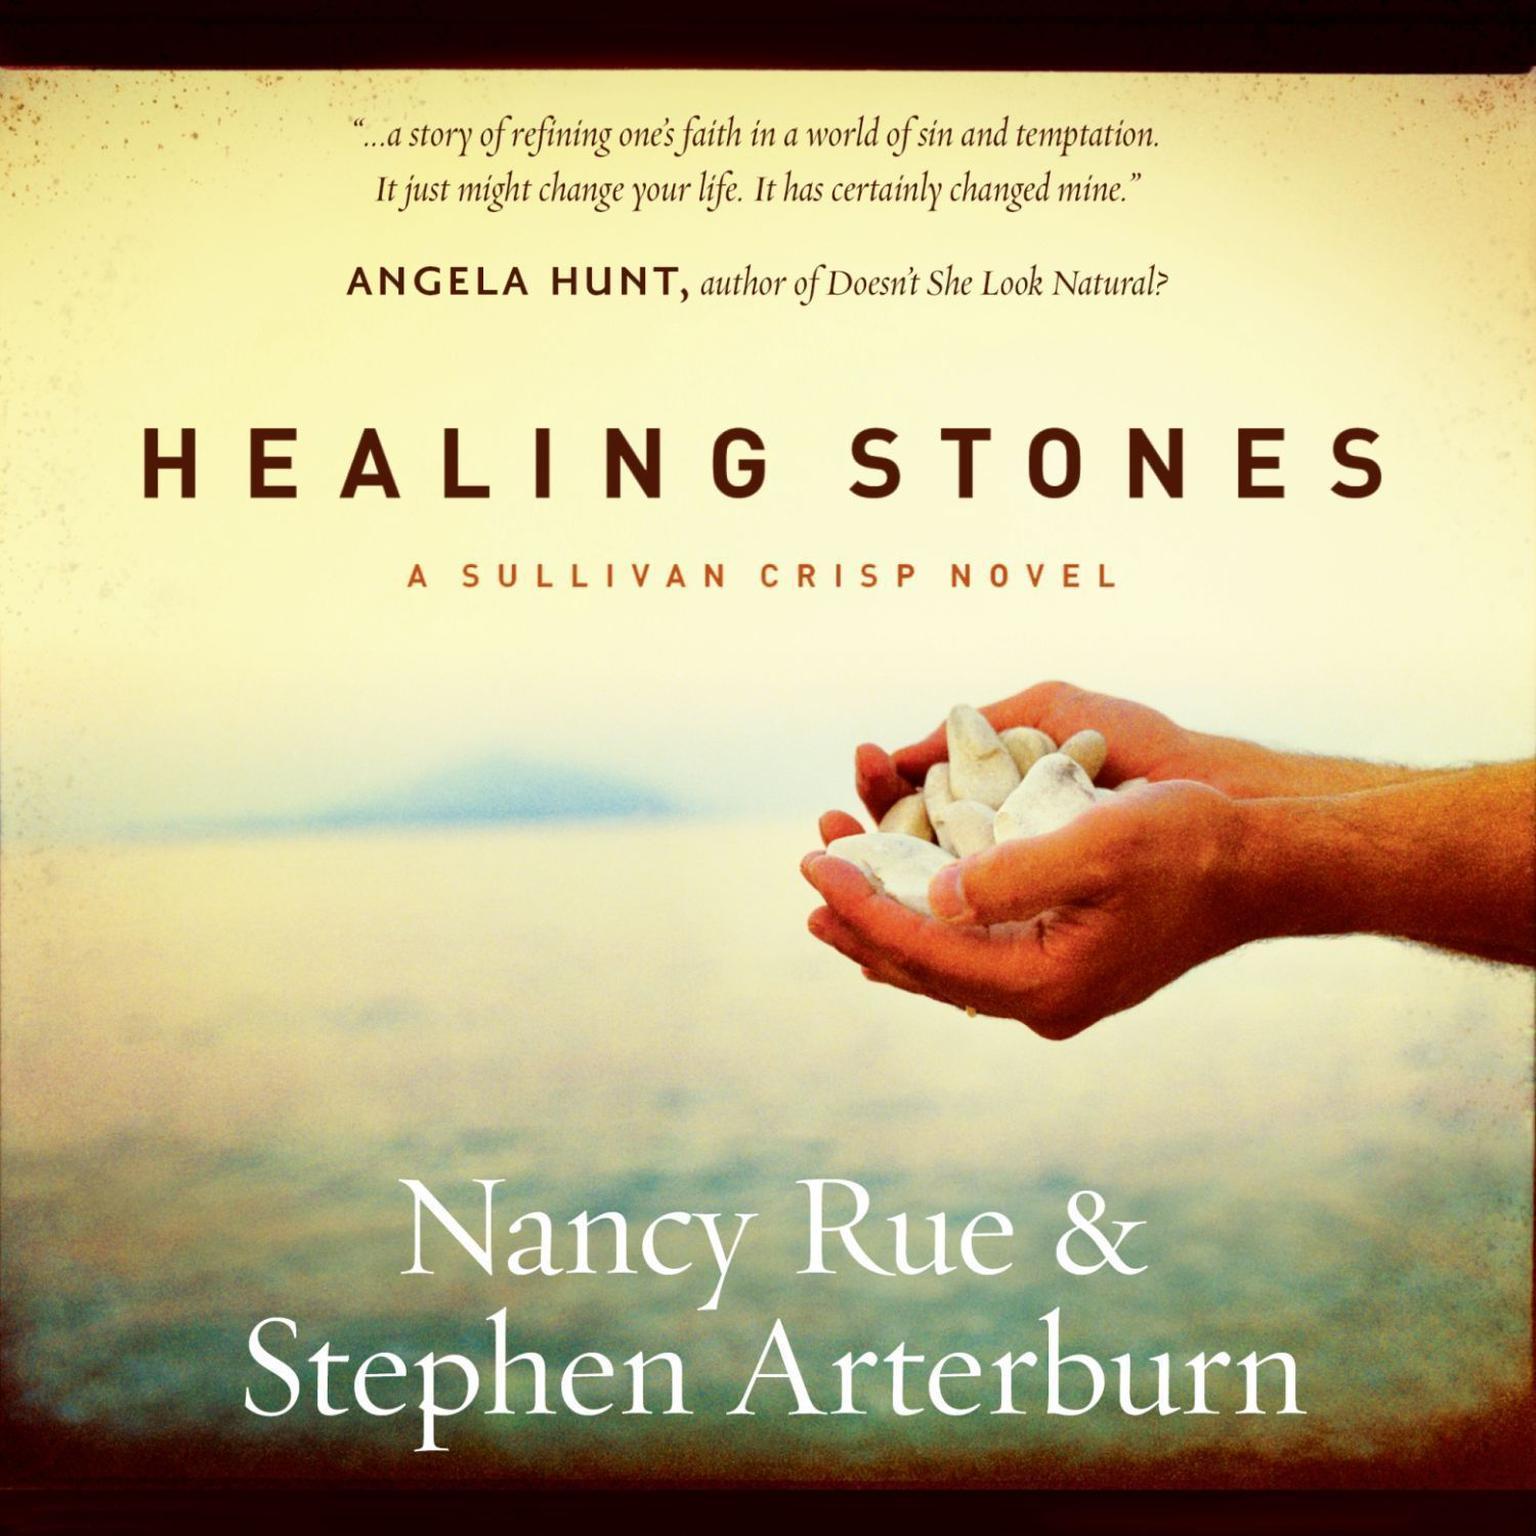 Printable Healing Stones Audiobook Cover Art